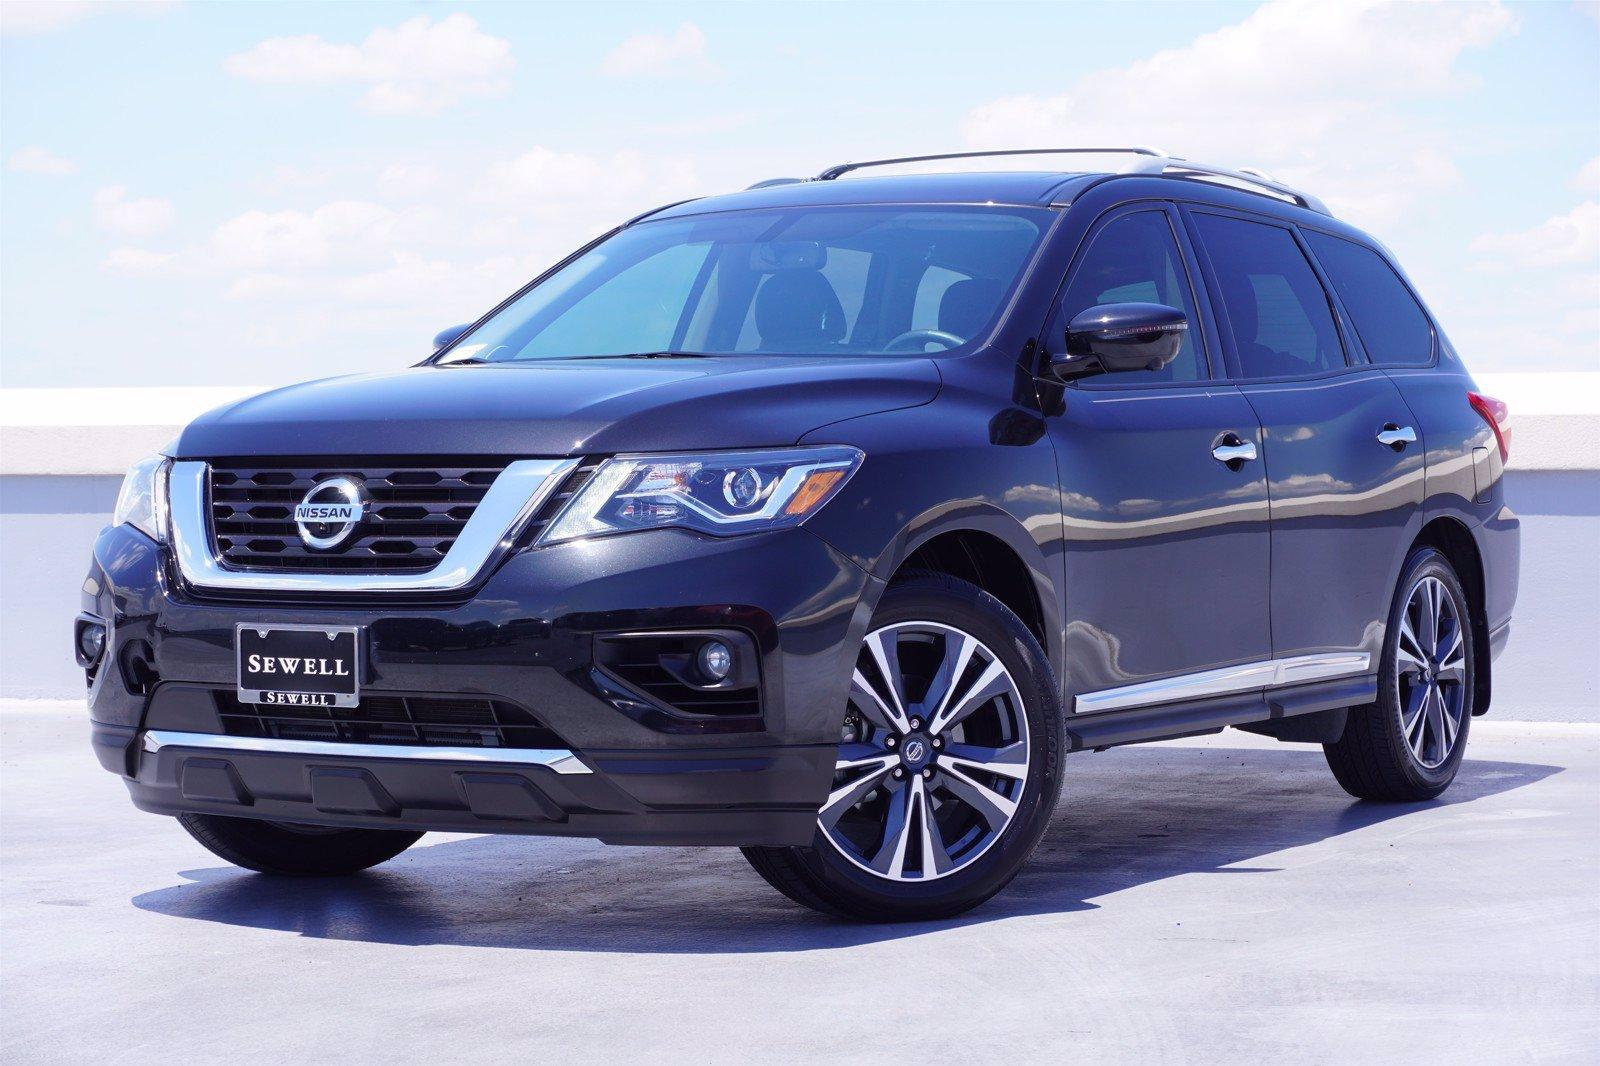 2019 Nissan Pathfinder Vehicle Photo in Dallas, TX 75209